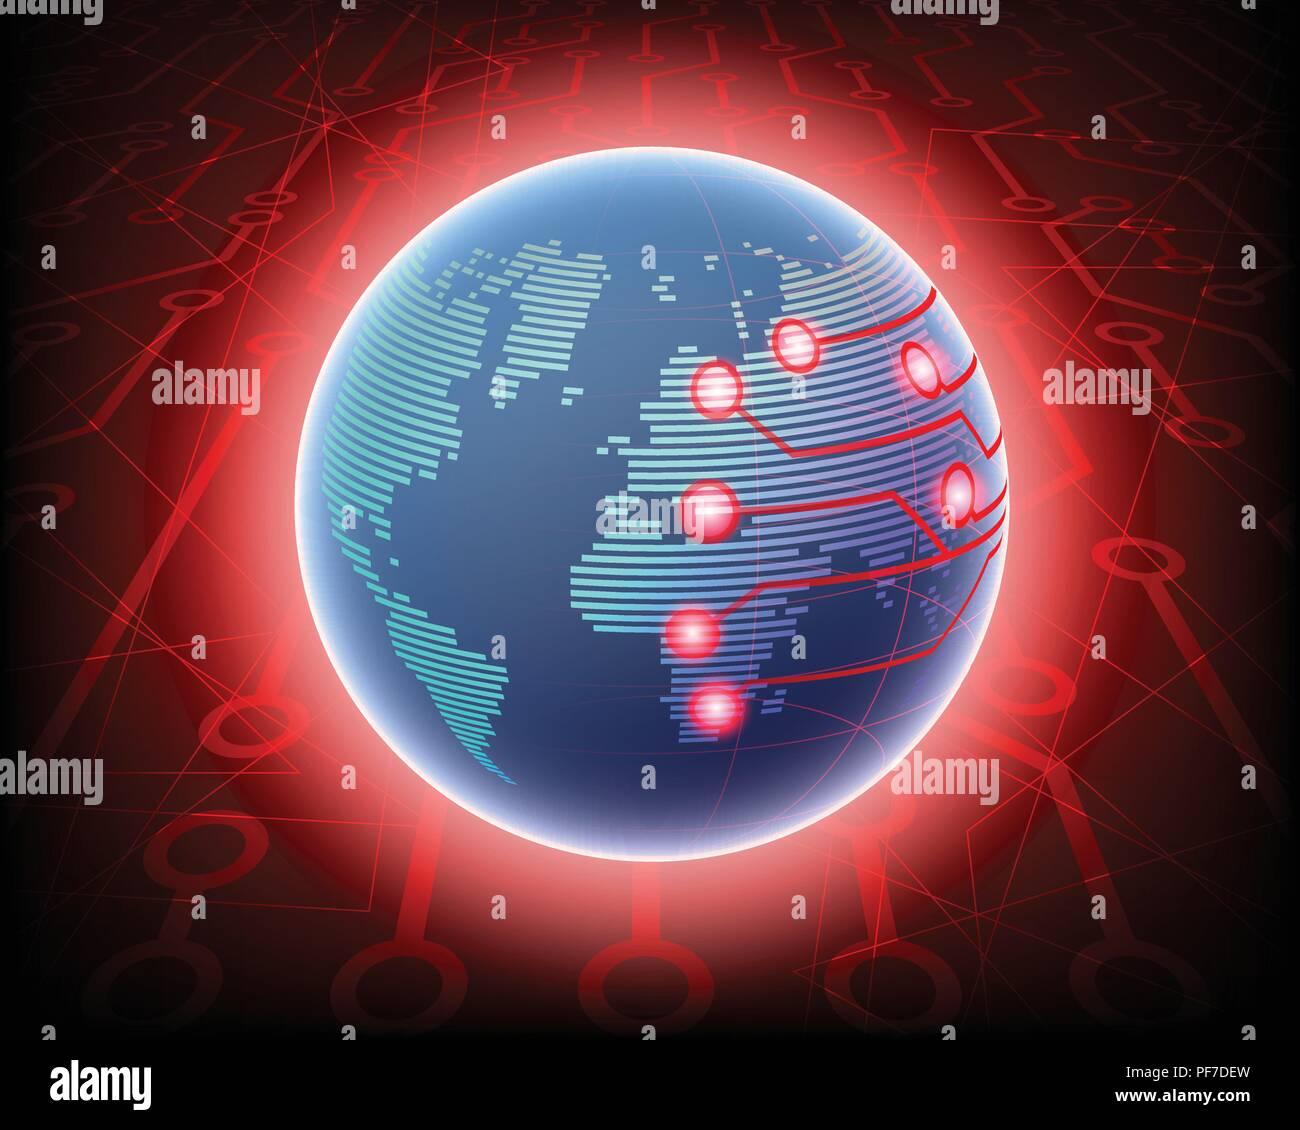 Acceso inalámbrico a internet en todo el mundo global cyber ataque cibernético por concepto hacker fondo. ilustración vectorial EPS10 Imagen De Stock